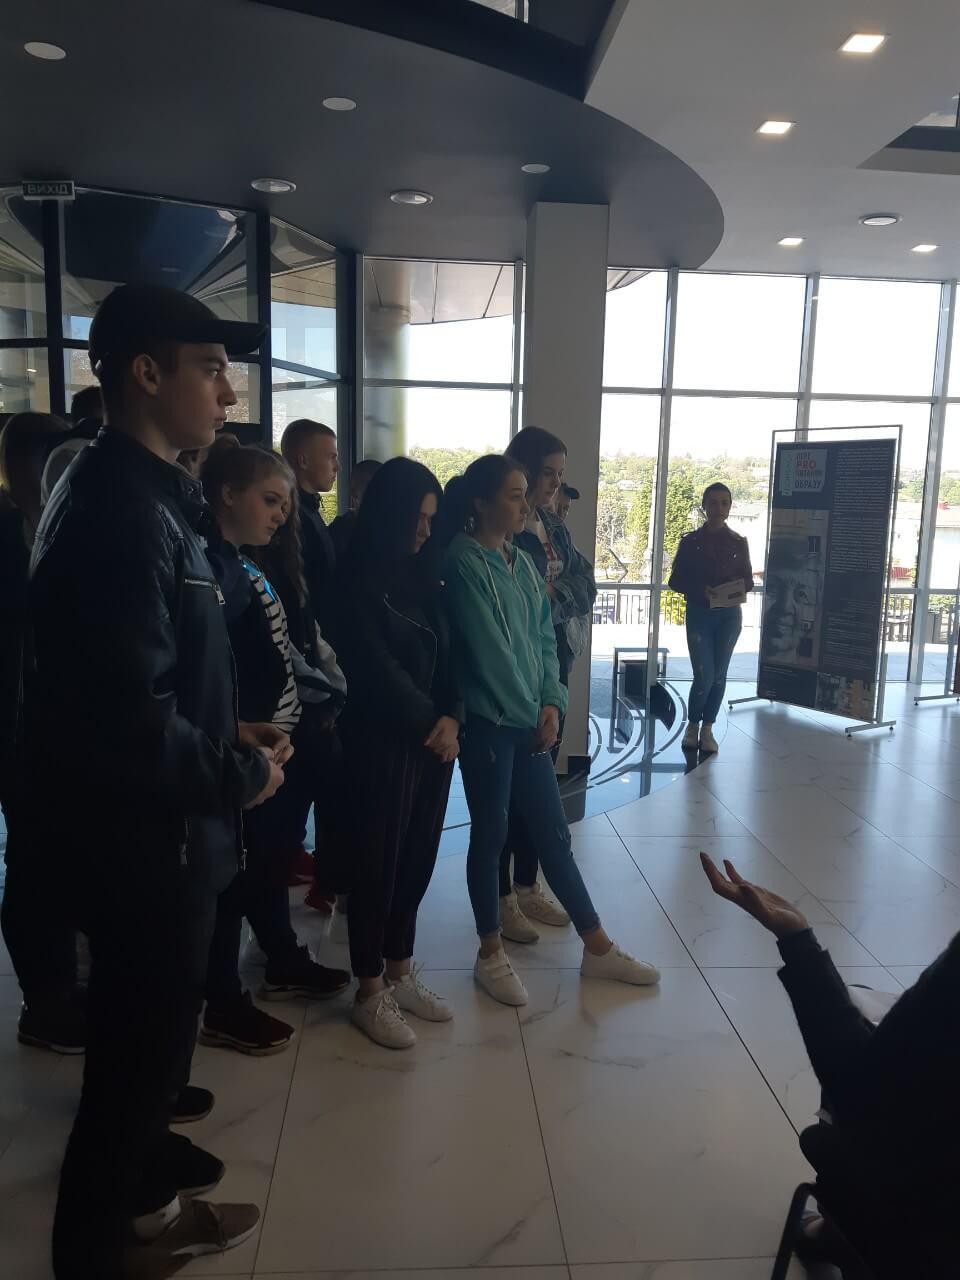 viber image 2019 05 13 19.52.23 - «Донбас: переPROчитання образу»